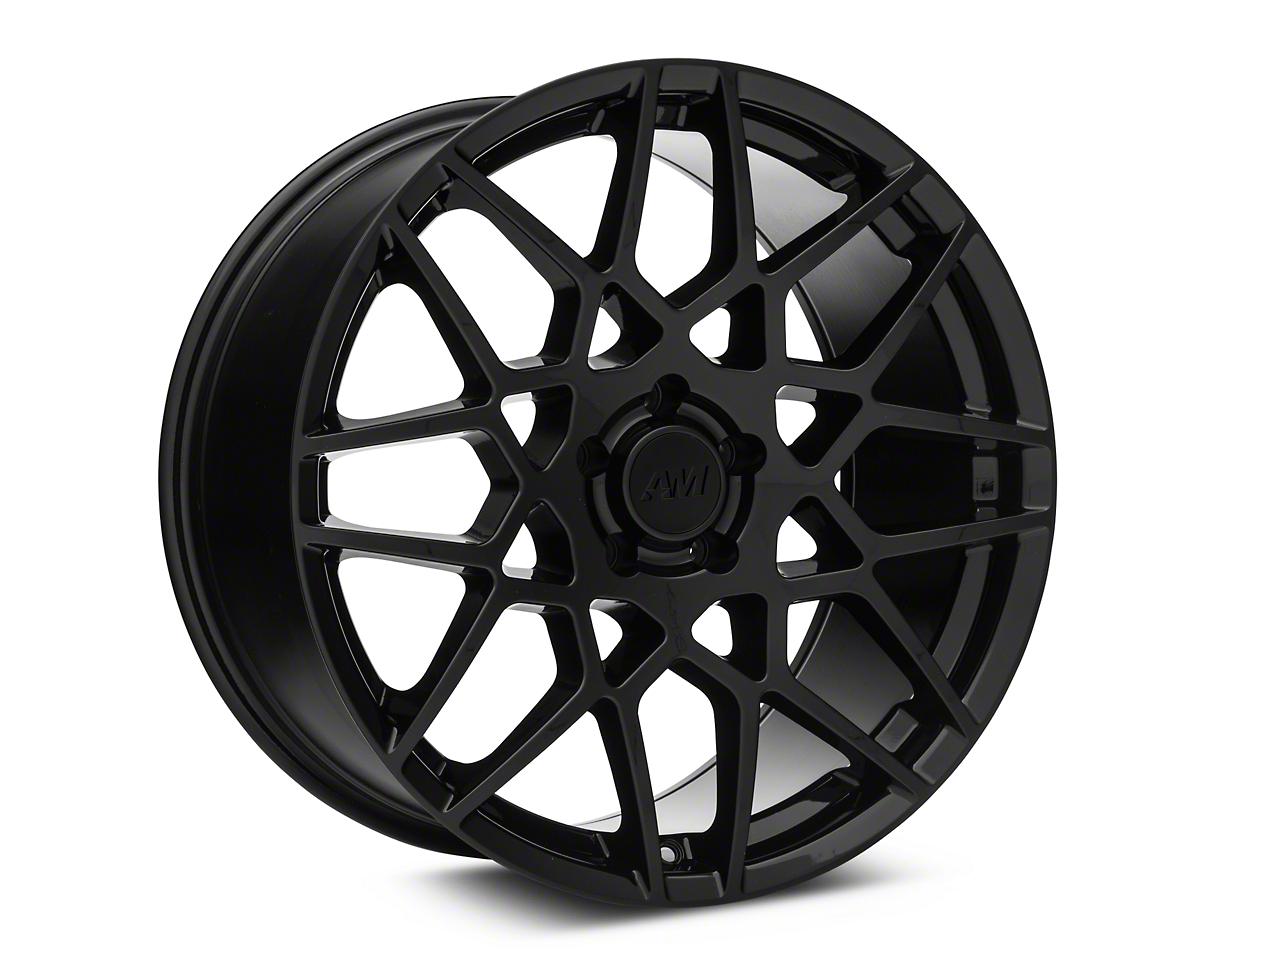 2013 GT500 Style Gloss Black Wheel - 20x10 (05-14 GT, V6)